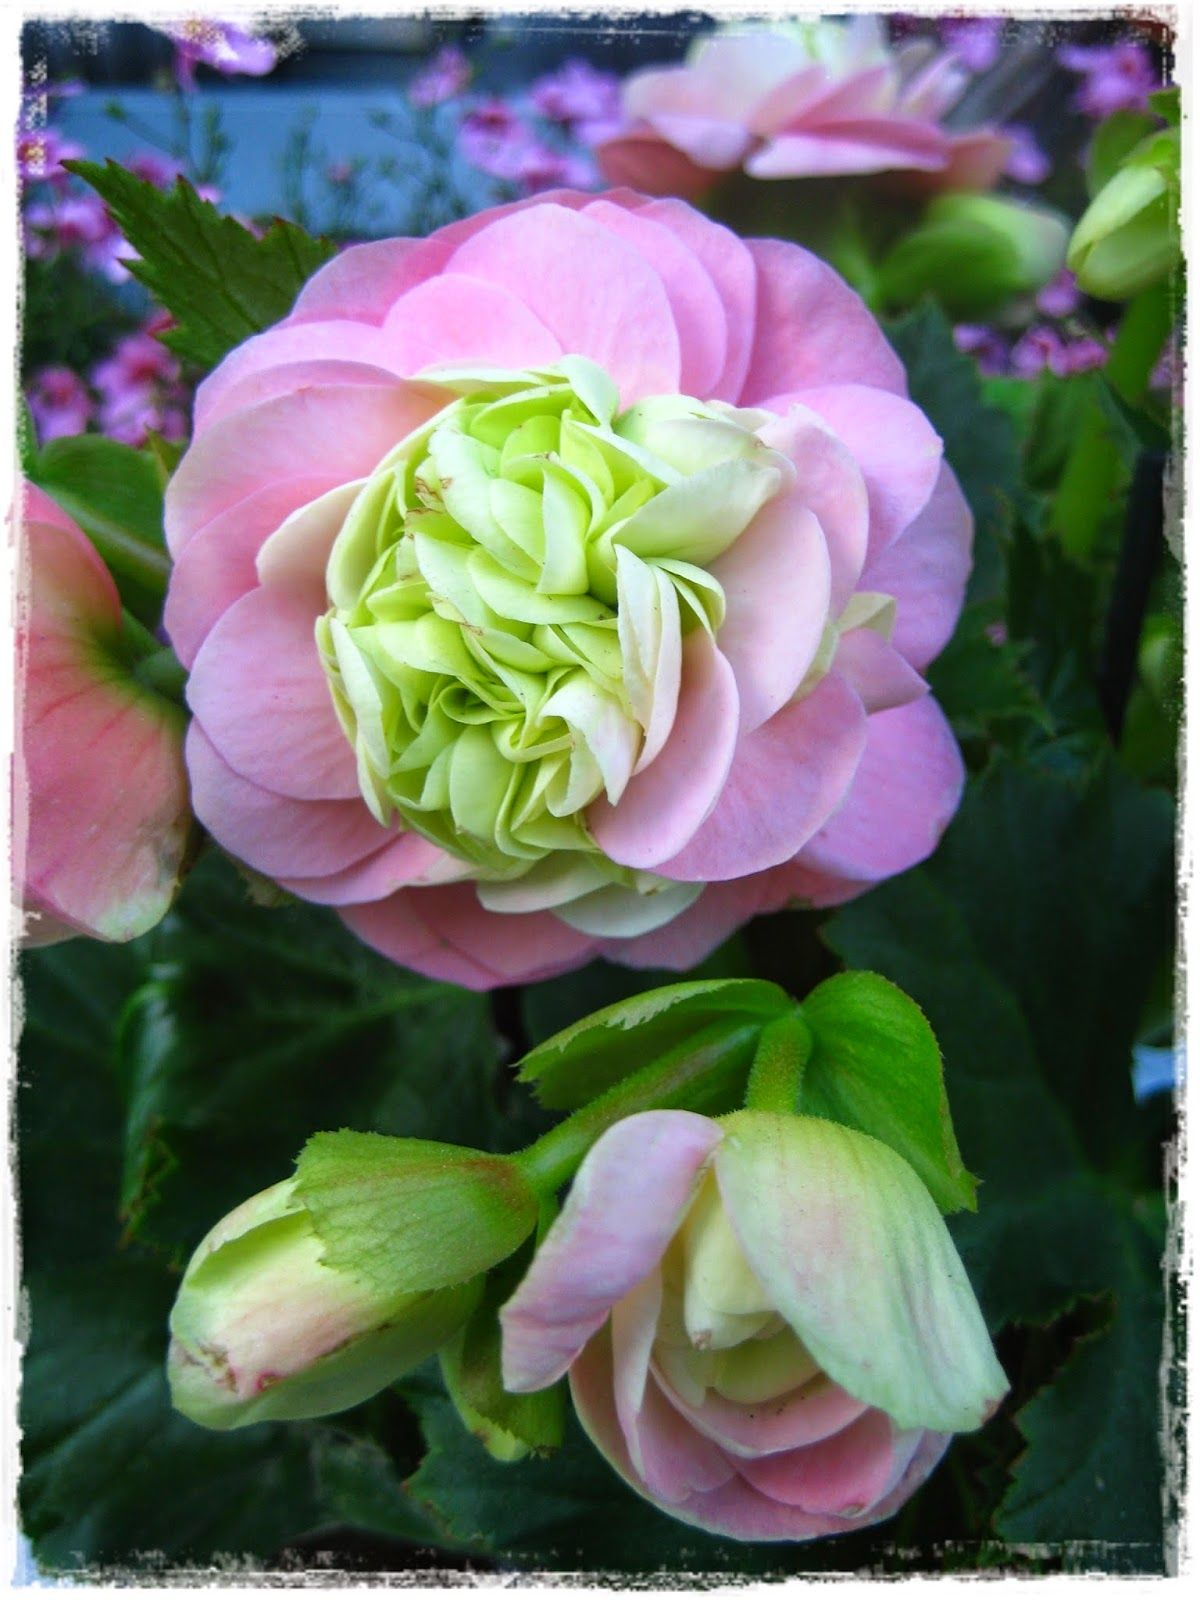 Tuijan koti ja puutarha; ruusubegonia